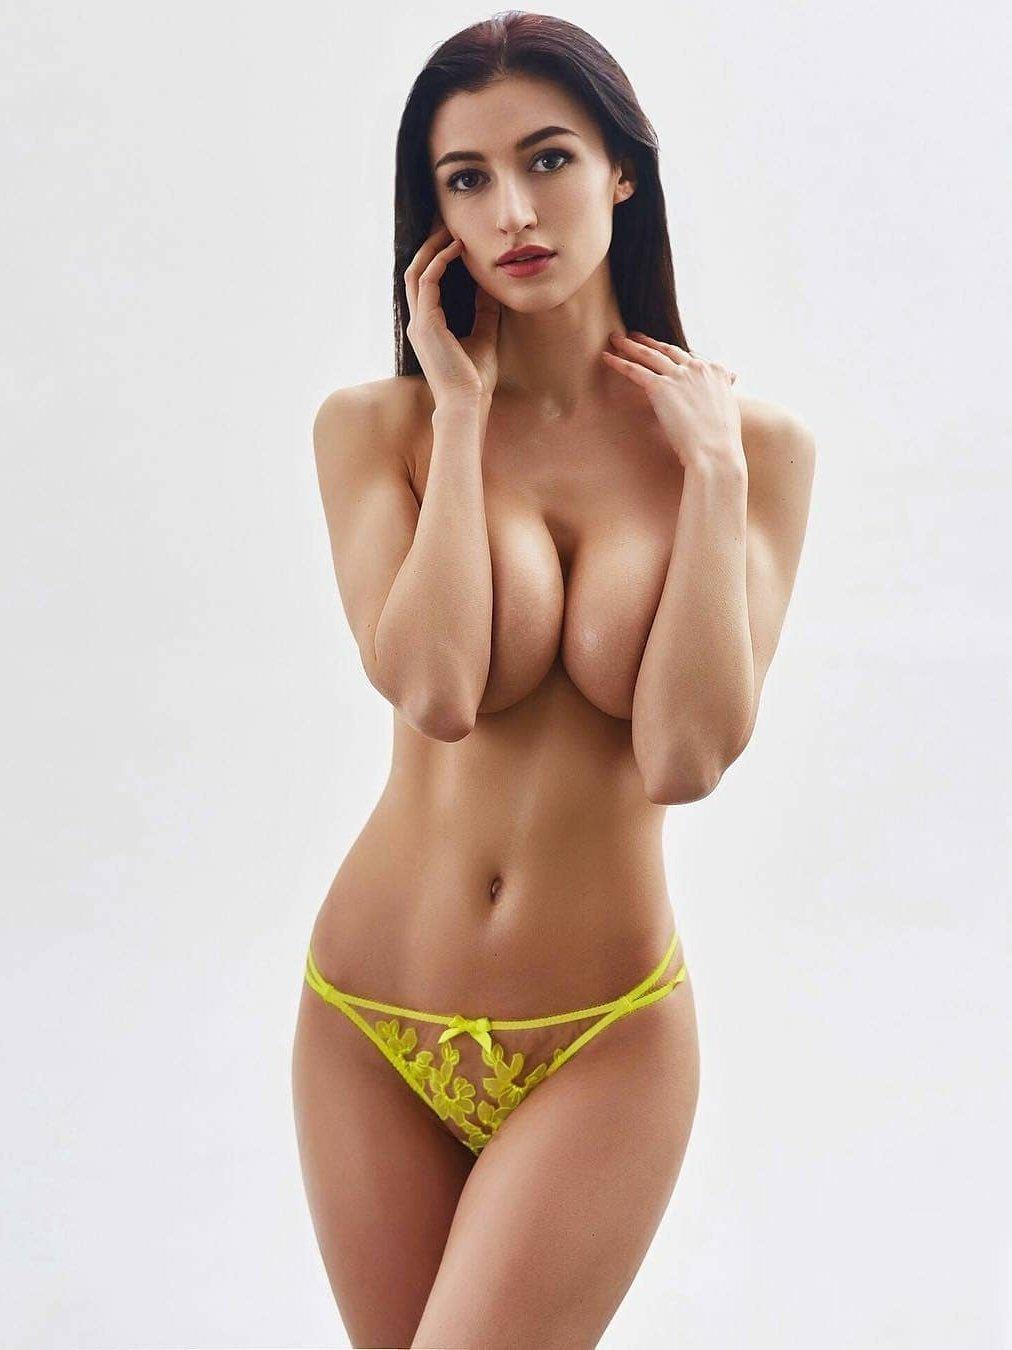 Maria Tretjakova nude model 3